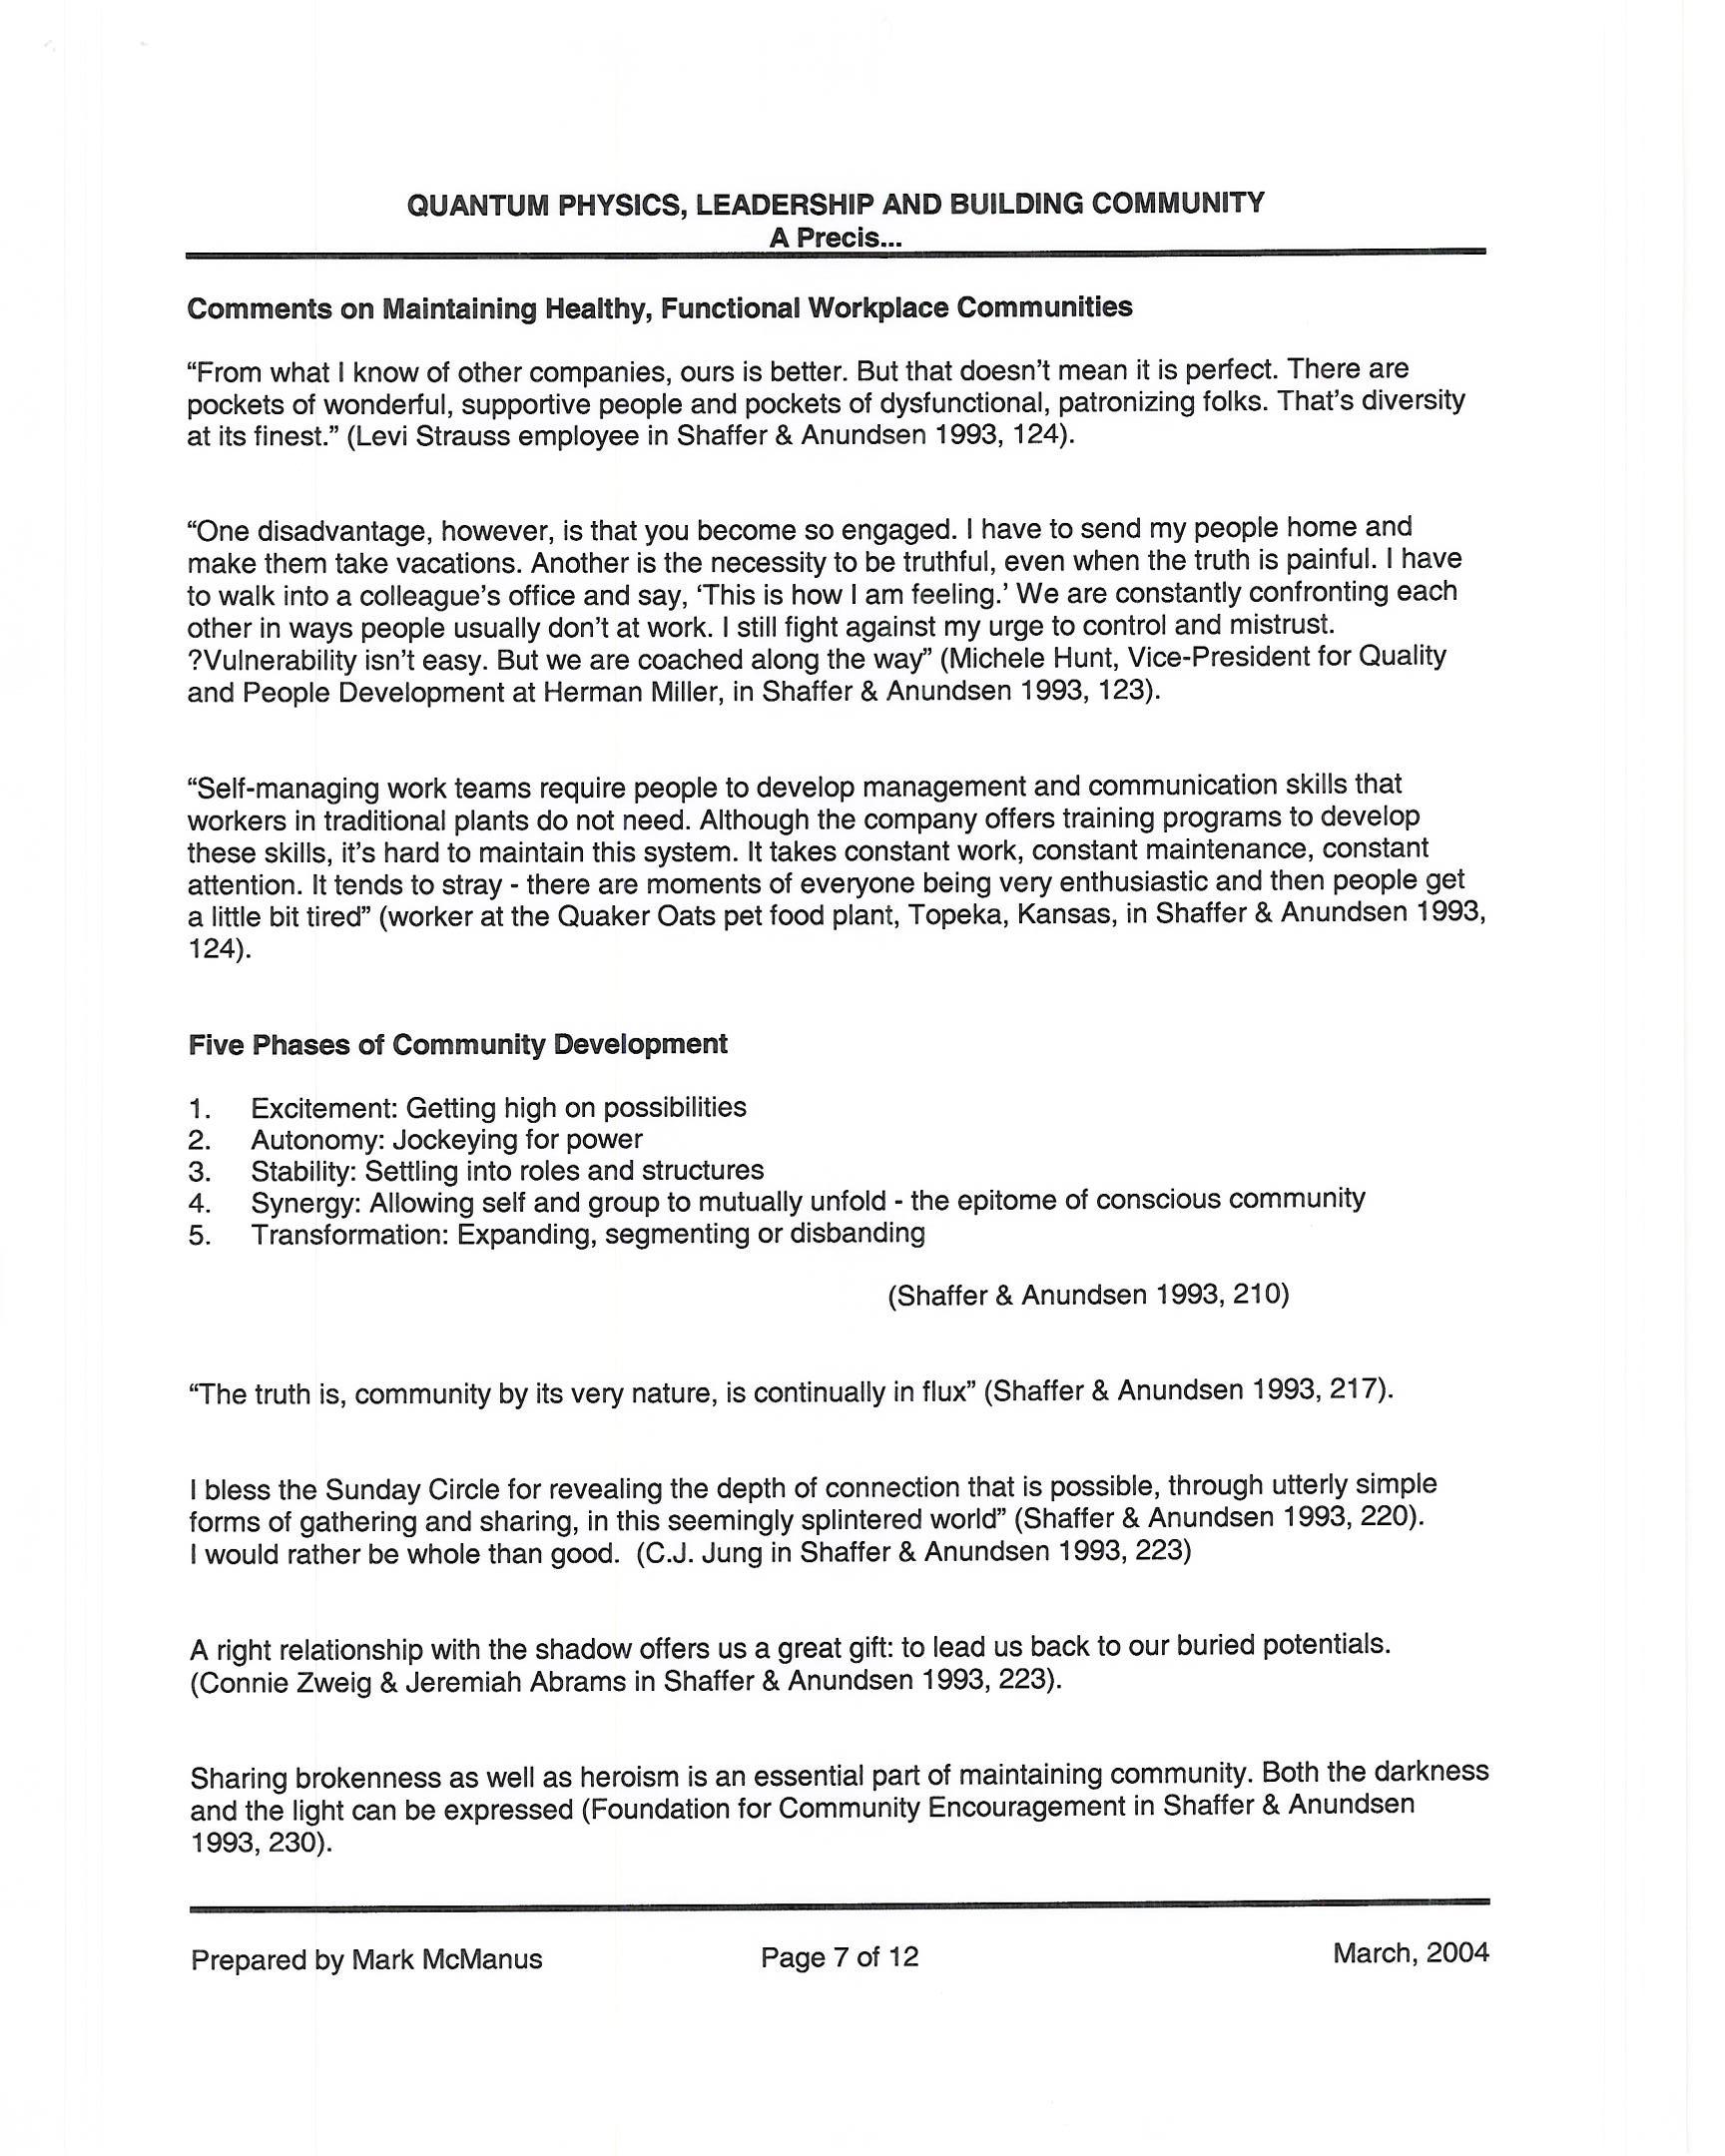 Quantum Physics+Leadership & Community Bldg_Page_07